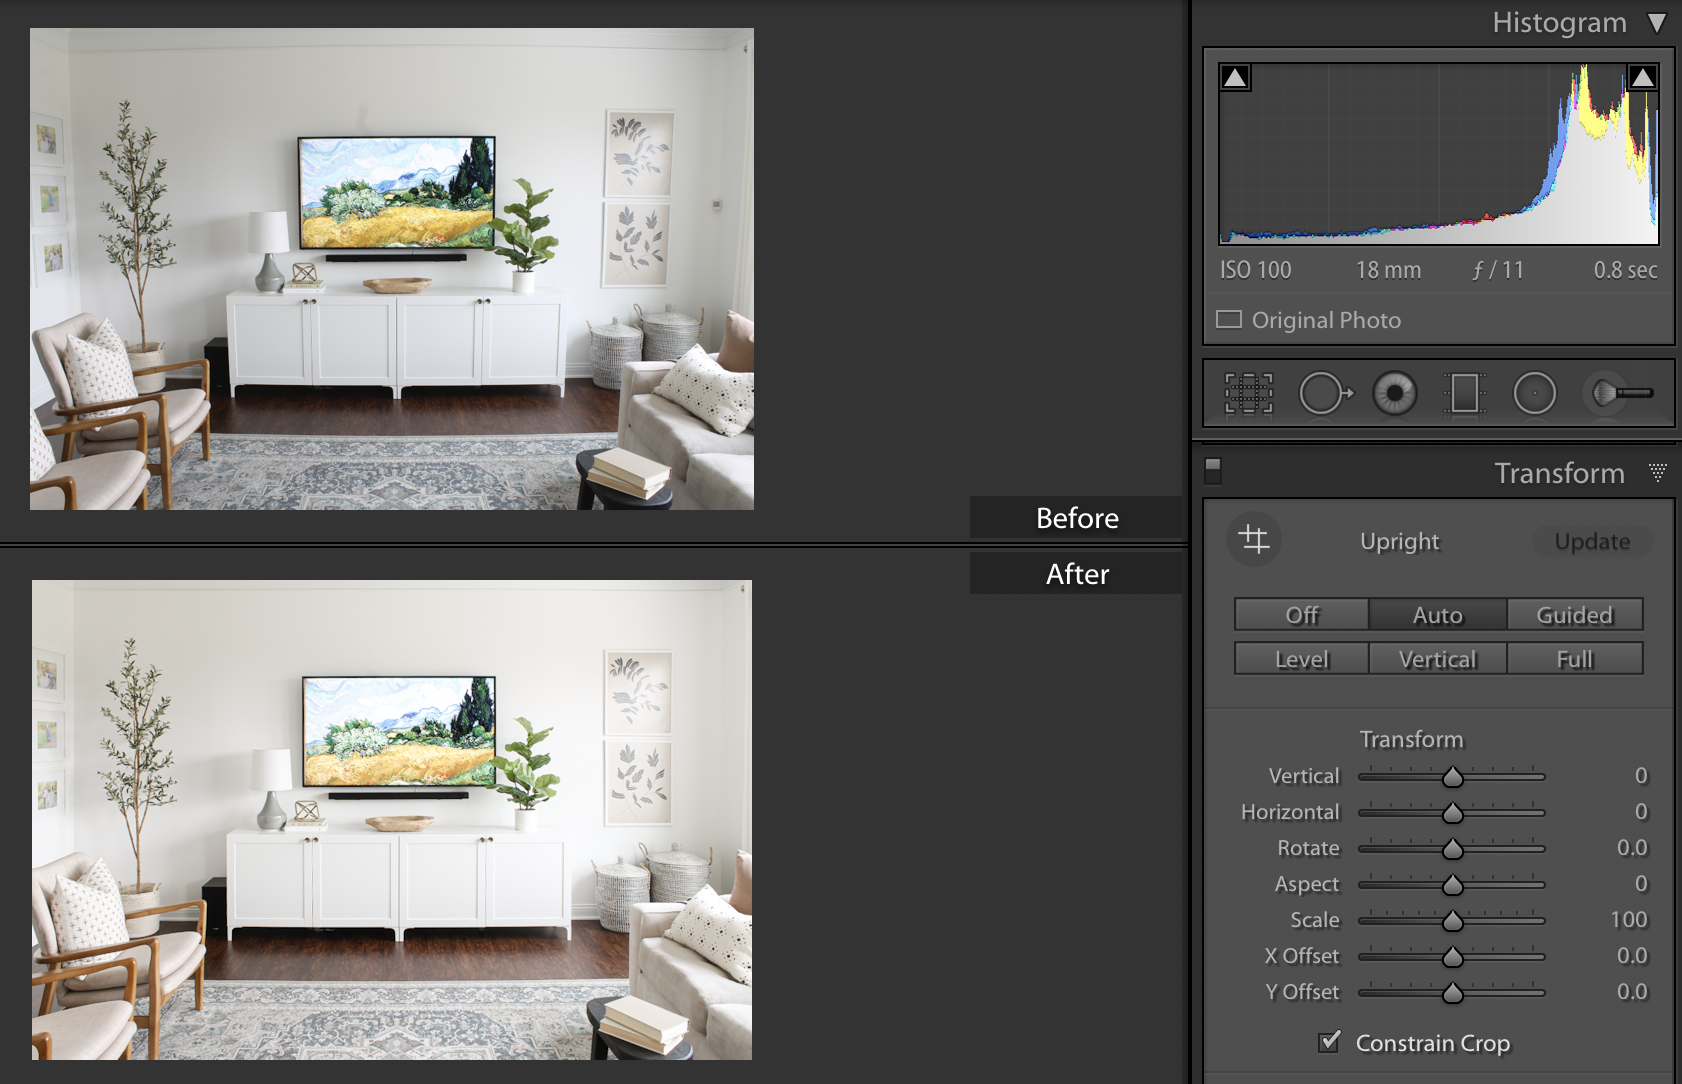 Interior Photography Tips - Lightroom Classic edits, camera distortion